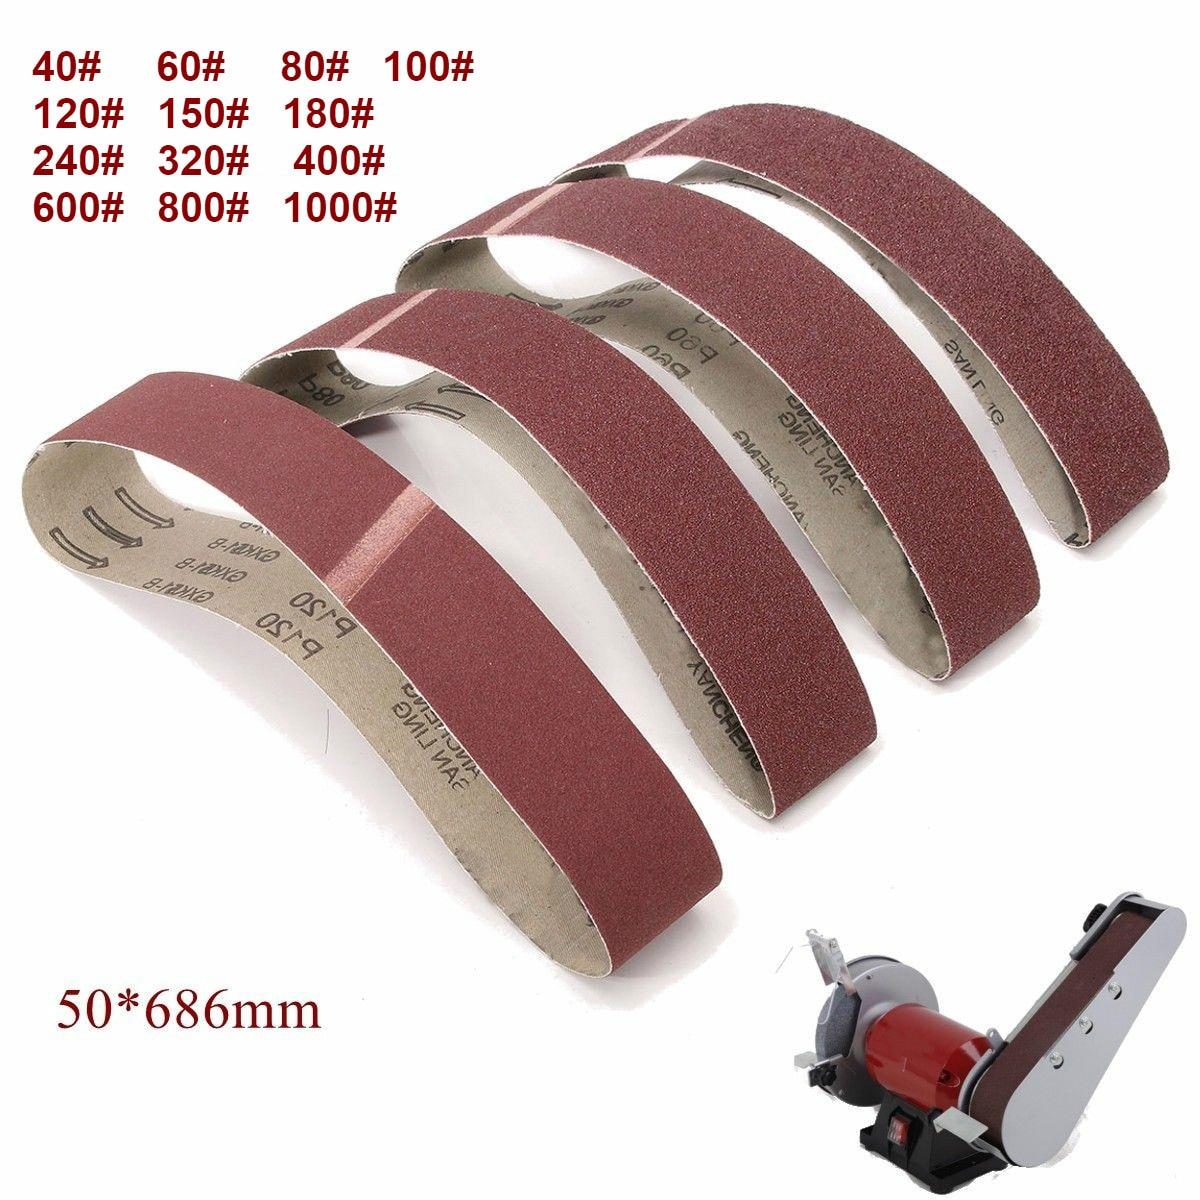 10Pack 686*50mm Sanding Belts 40-1000 Grit  Aluminium Oxide Sander Sanding Belts